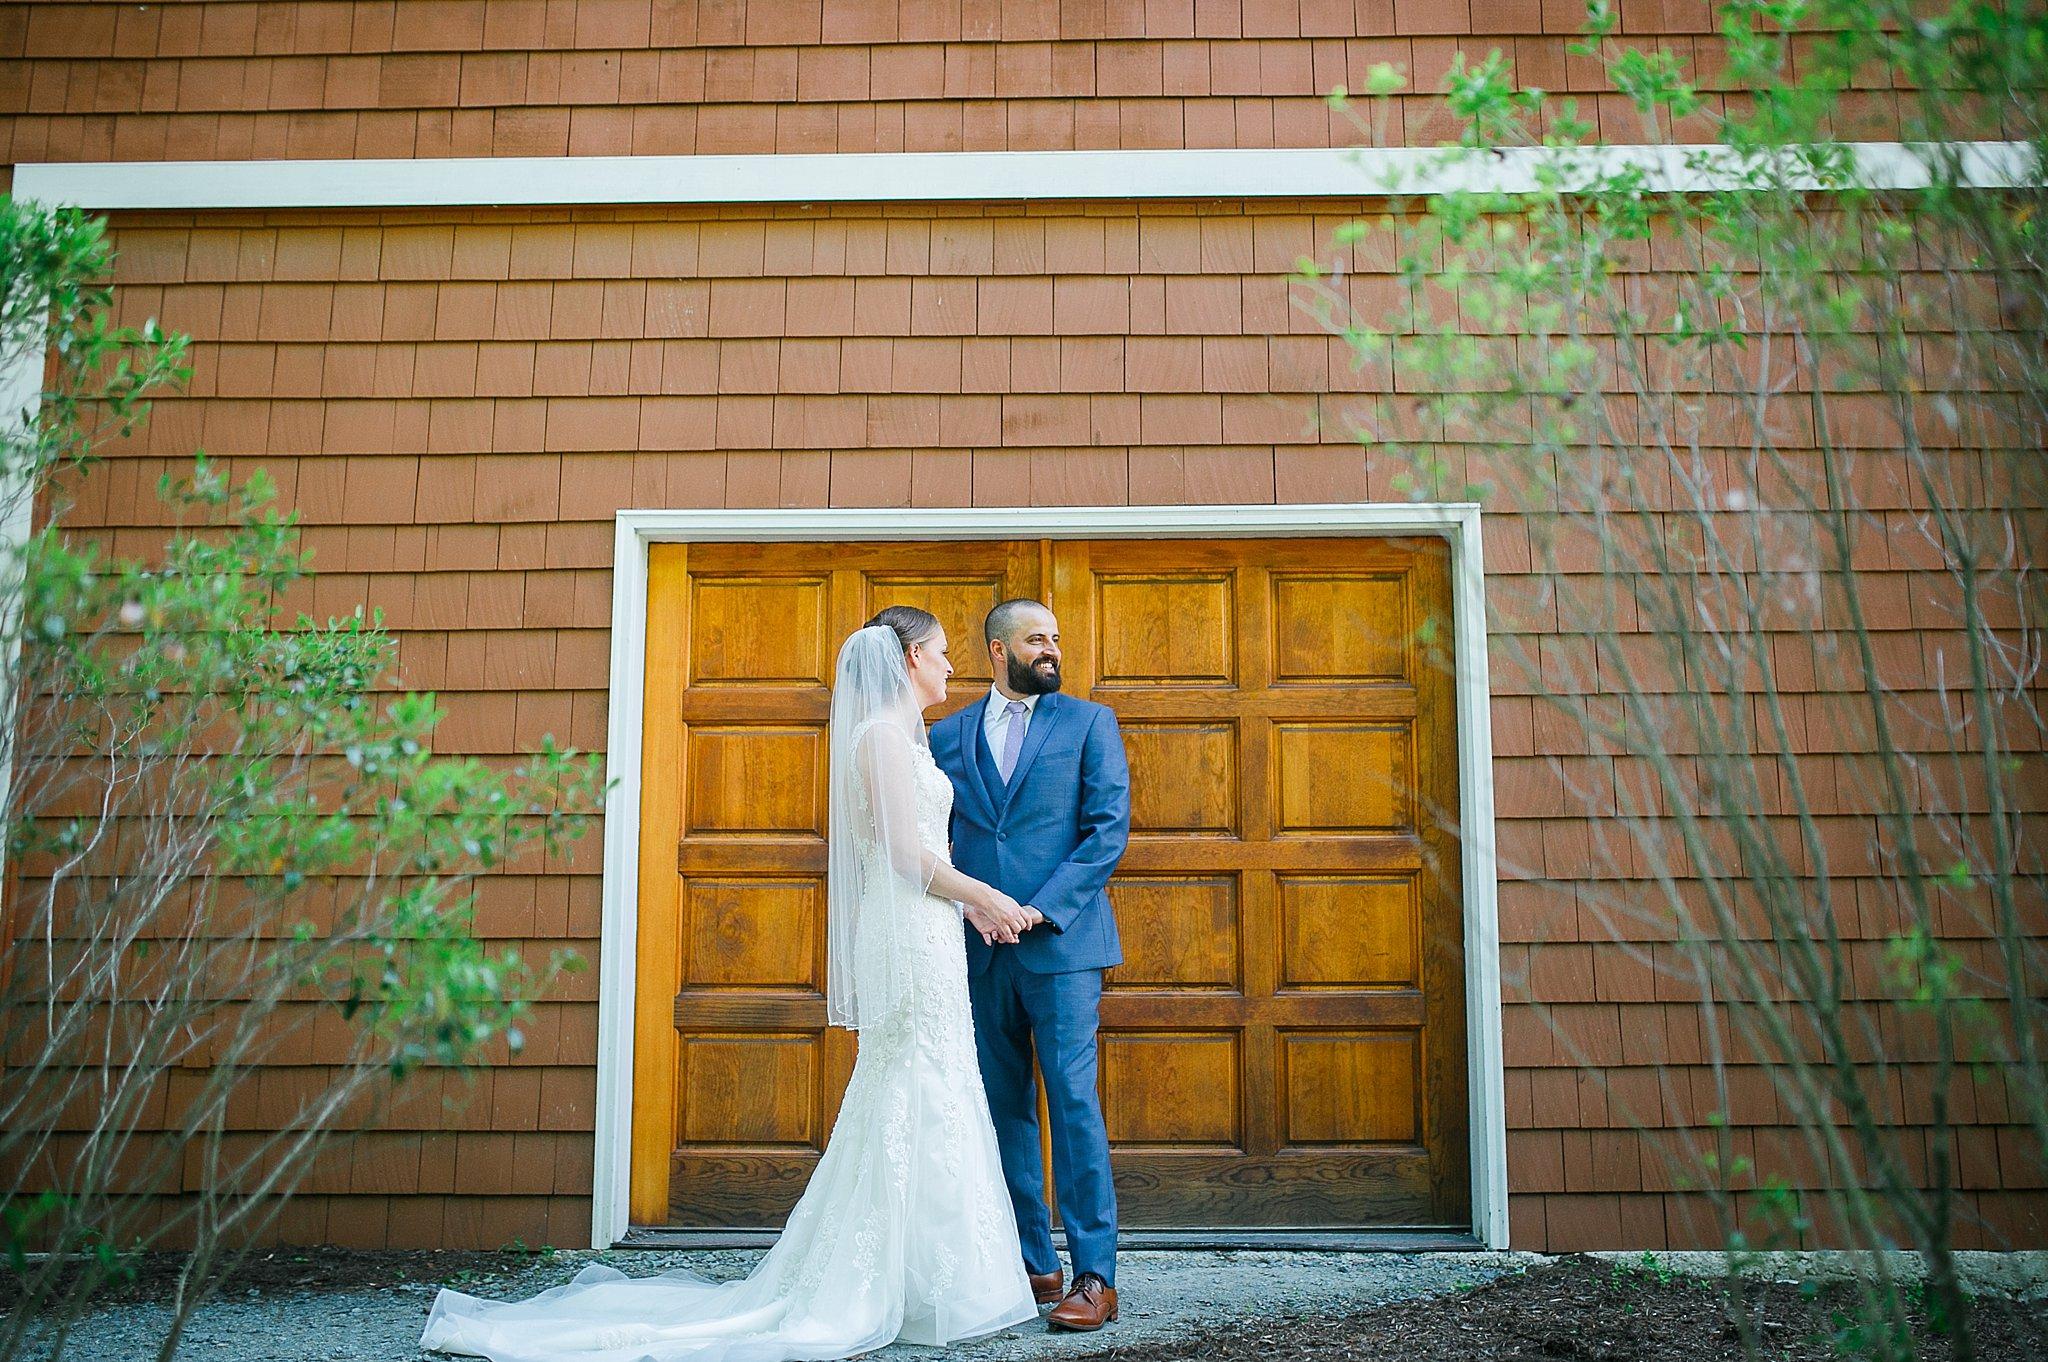 Hollow Brook Golf Club Cortlandt Manor NY Wedding Sweet Alice Photography June Wedding28.jpg